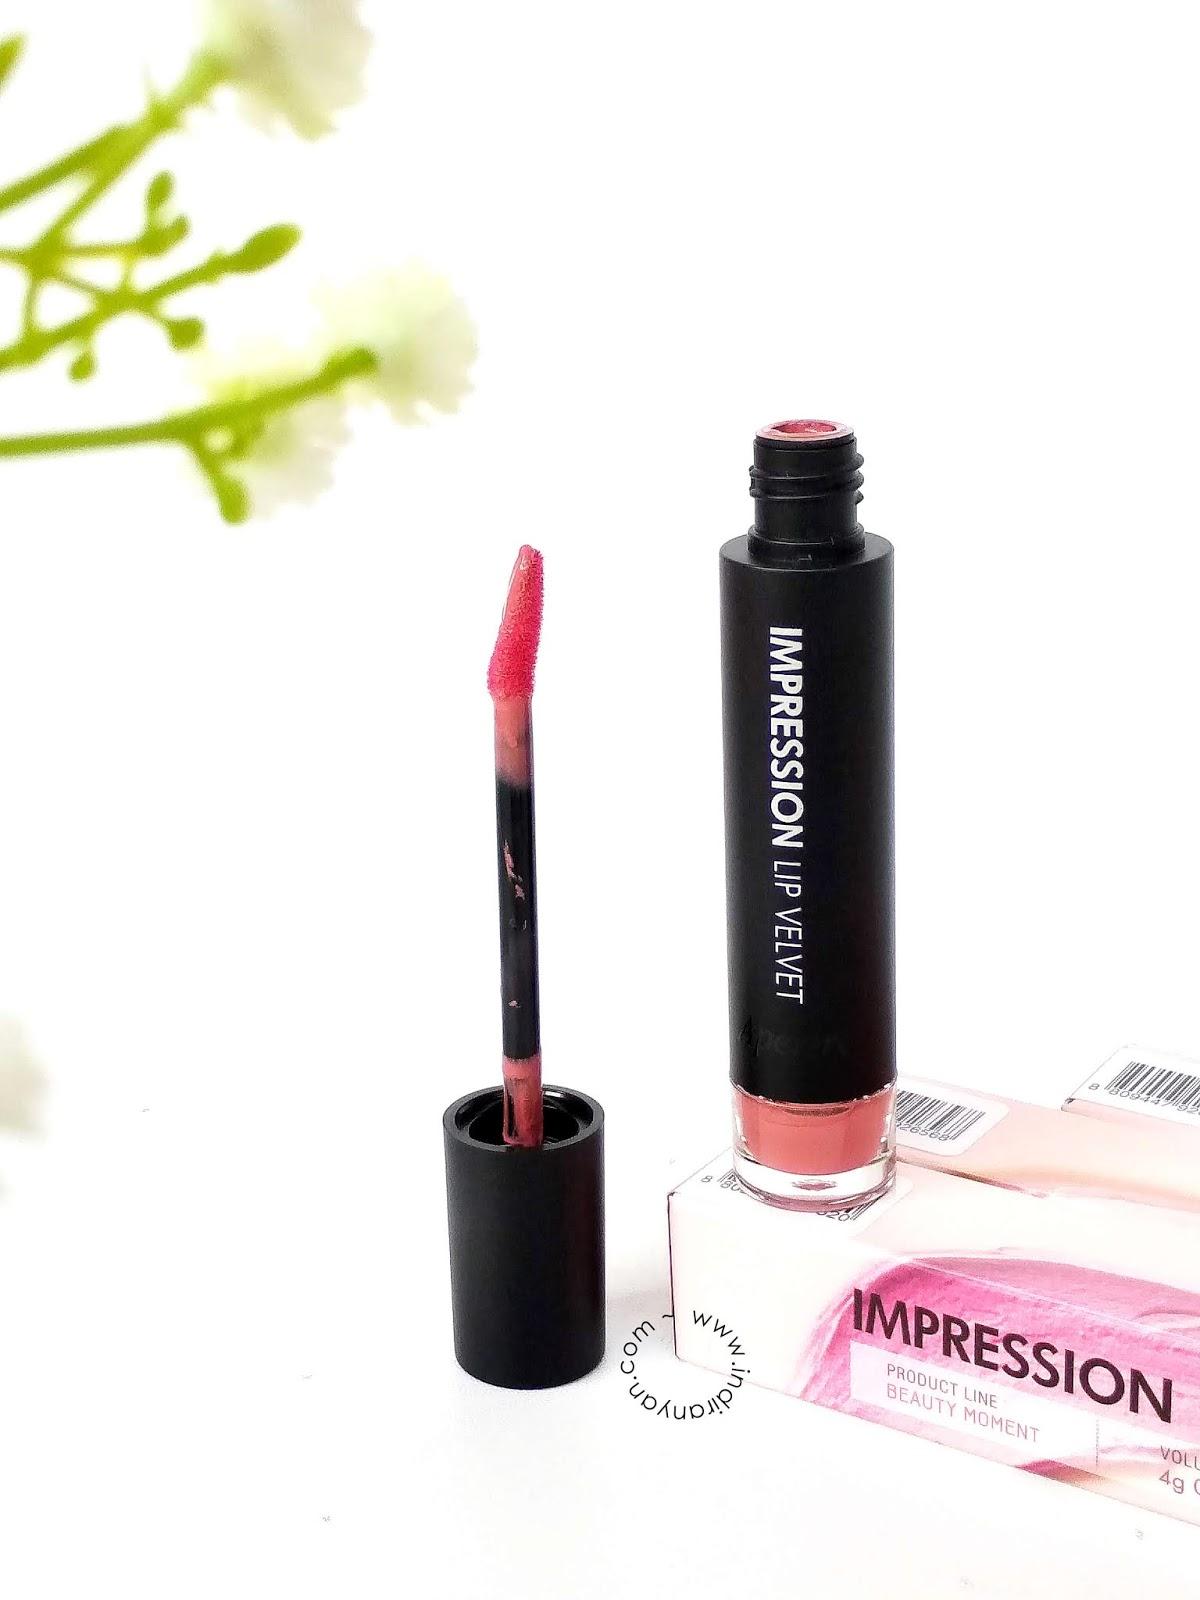 aperire-impression-lip-velvet, aperire-impression-lip-velvet-rose-bay